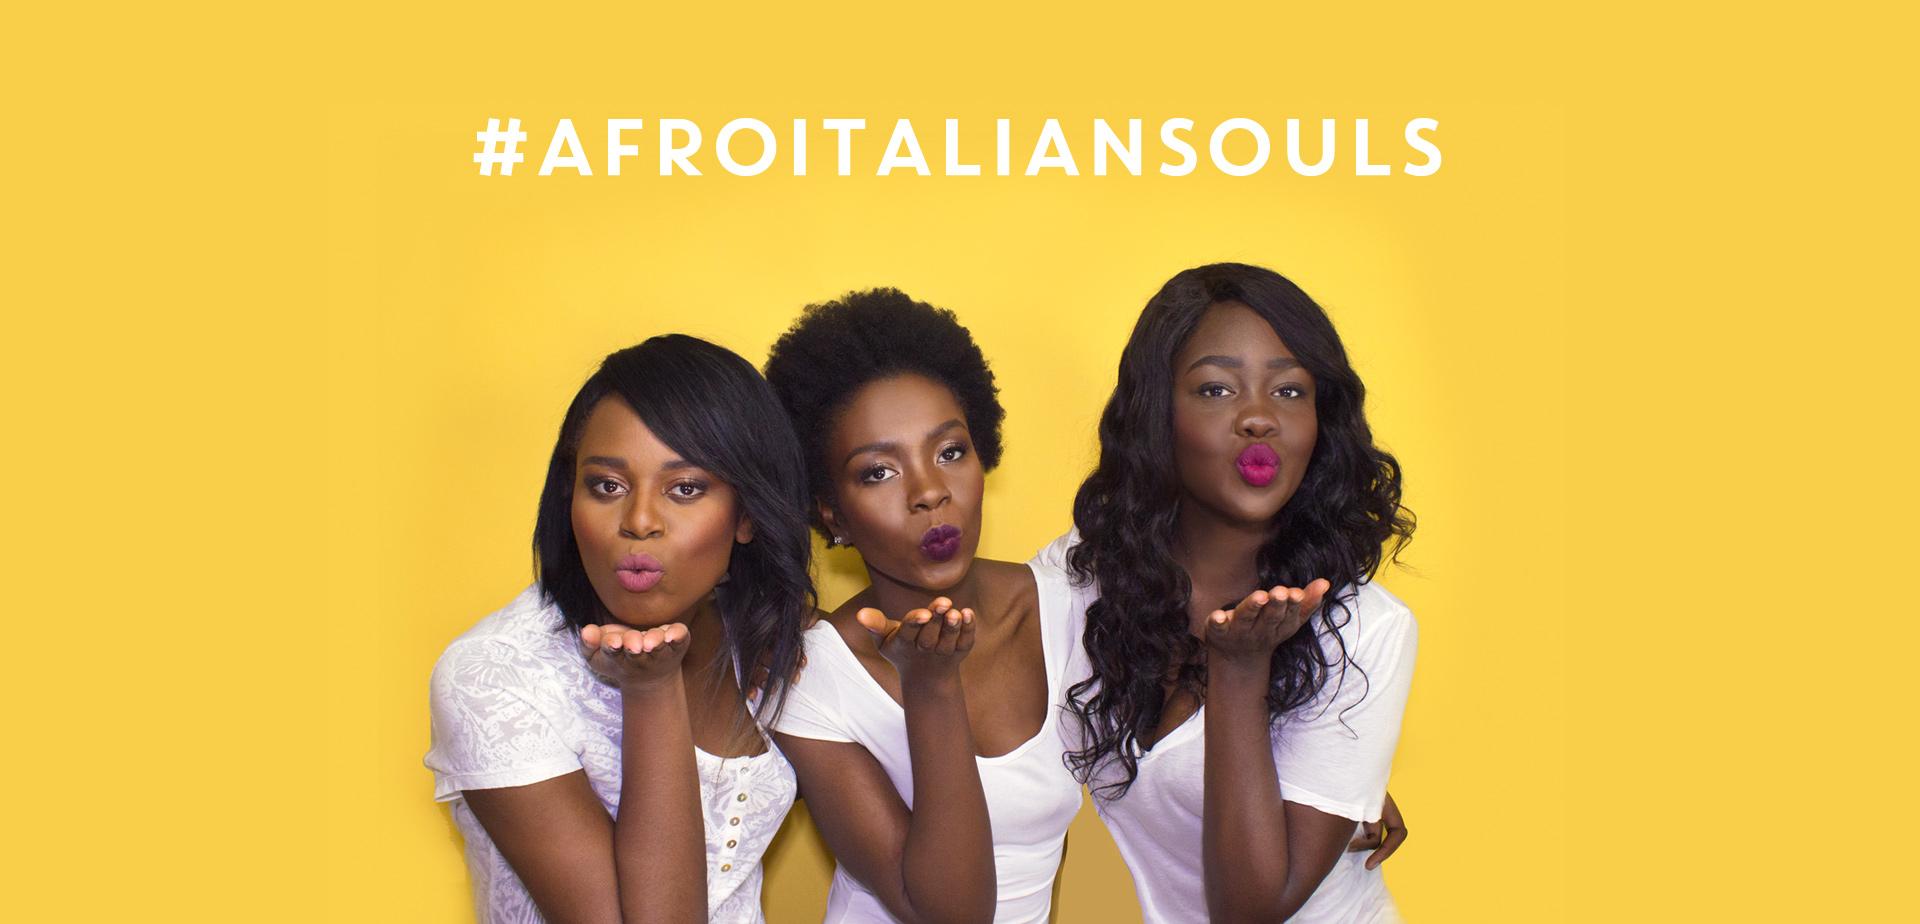 AFROITALIAN-SOULS hashtag